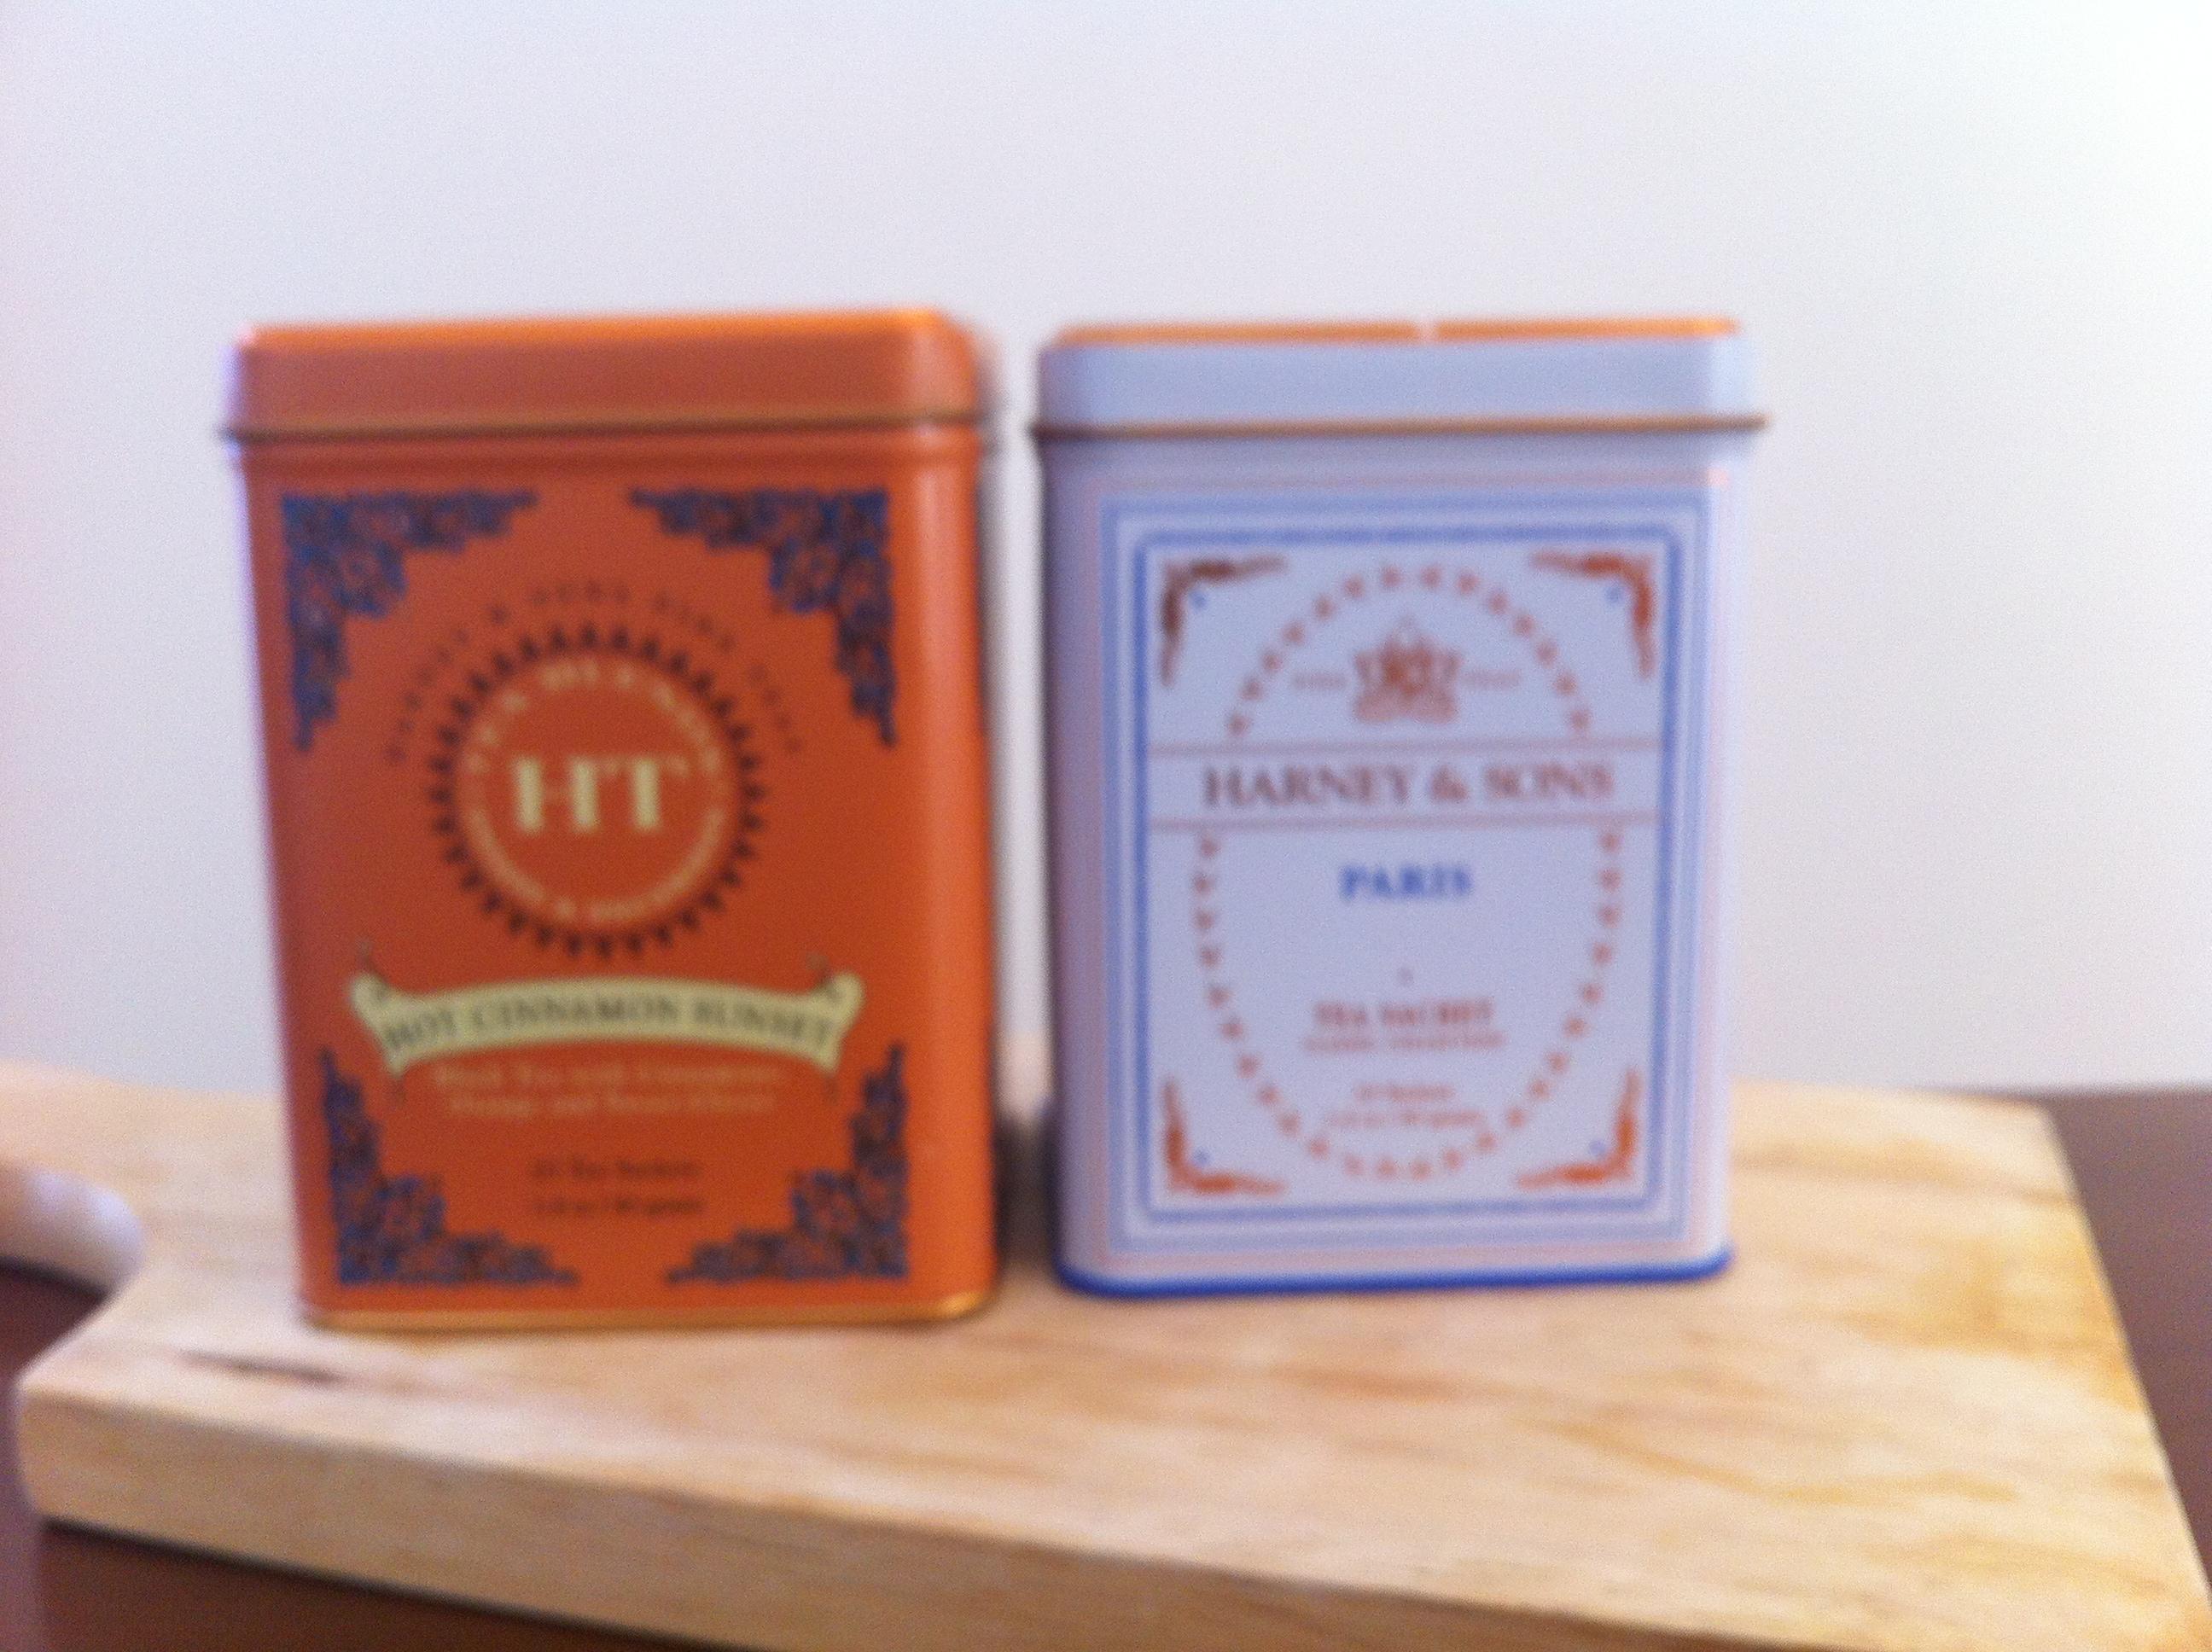 Dean&Delucaや高級ホテルでおなじみのHarney & Sons紅茶飲み比べ